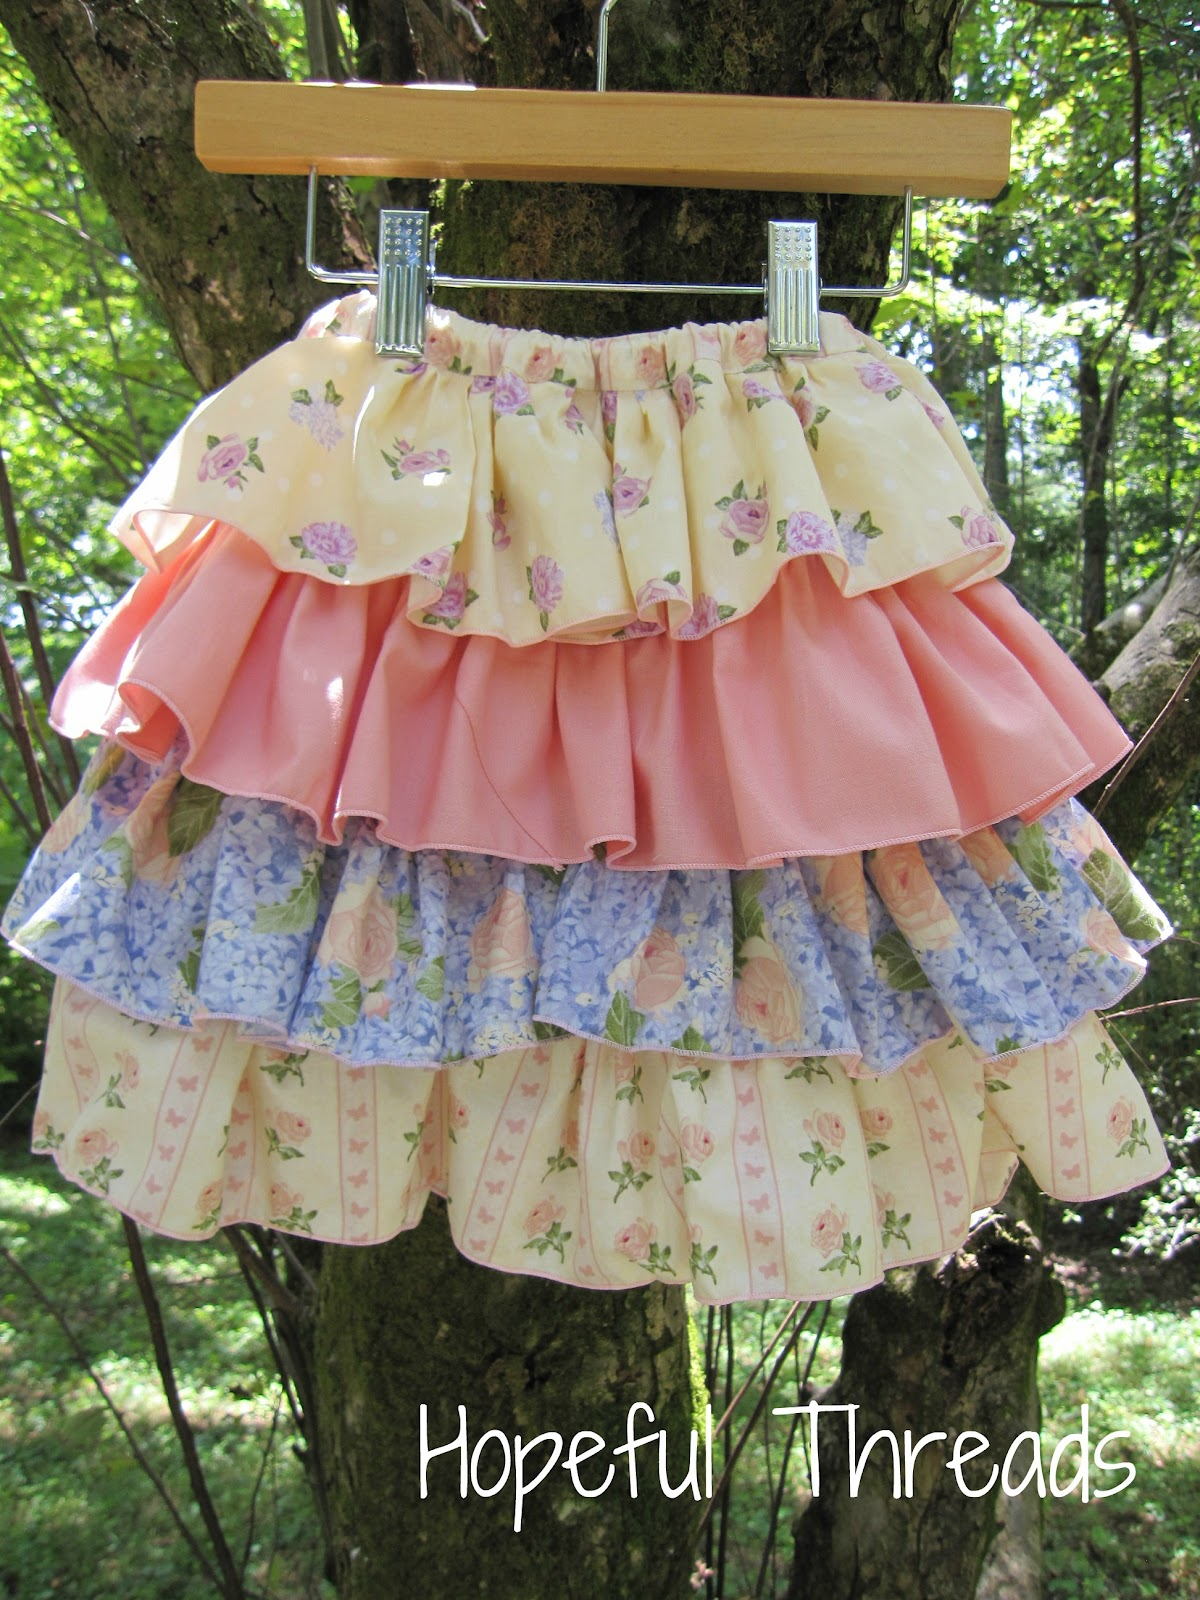 Hopeful threads pattern review ruffle twirl skirt by pattern review ruffle twirl skirt by bumbleberries boutique jeuxipadfo Image collections